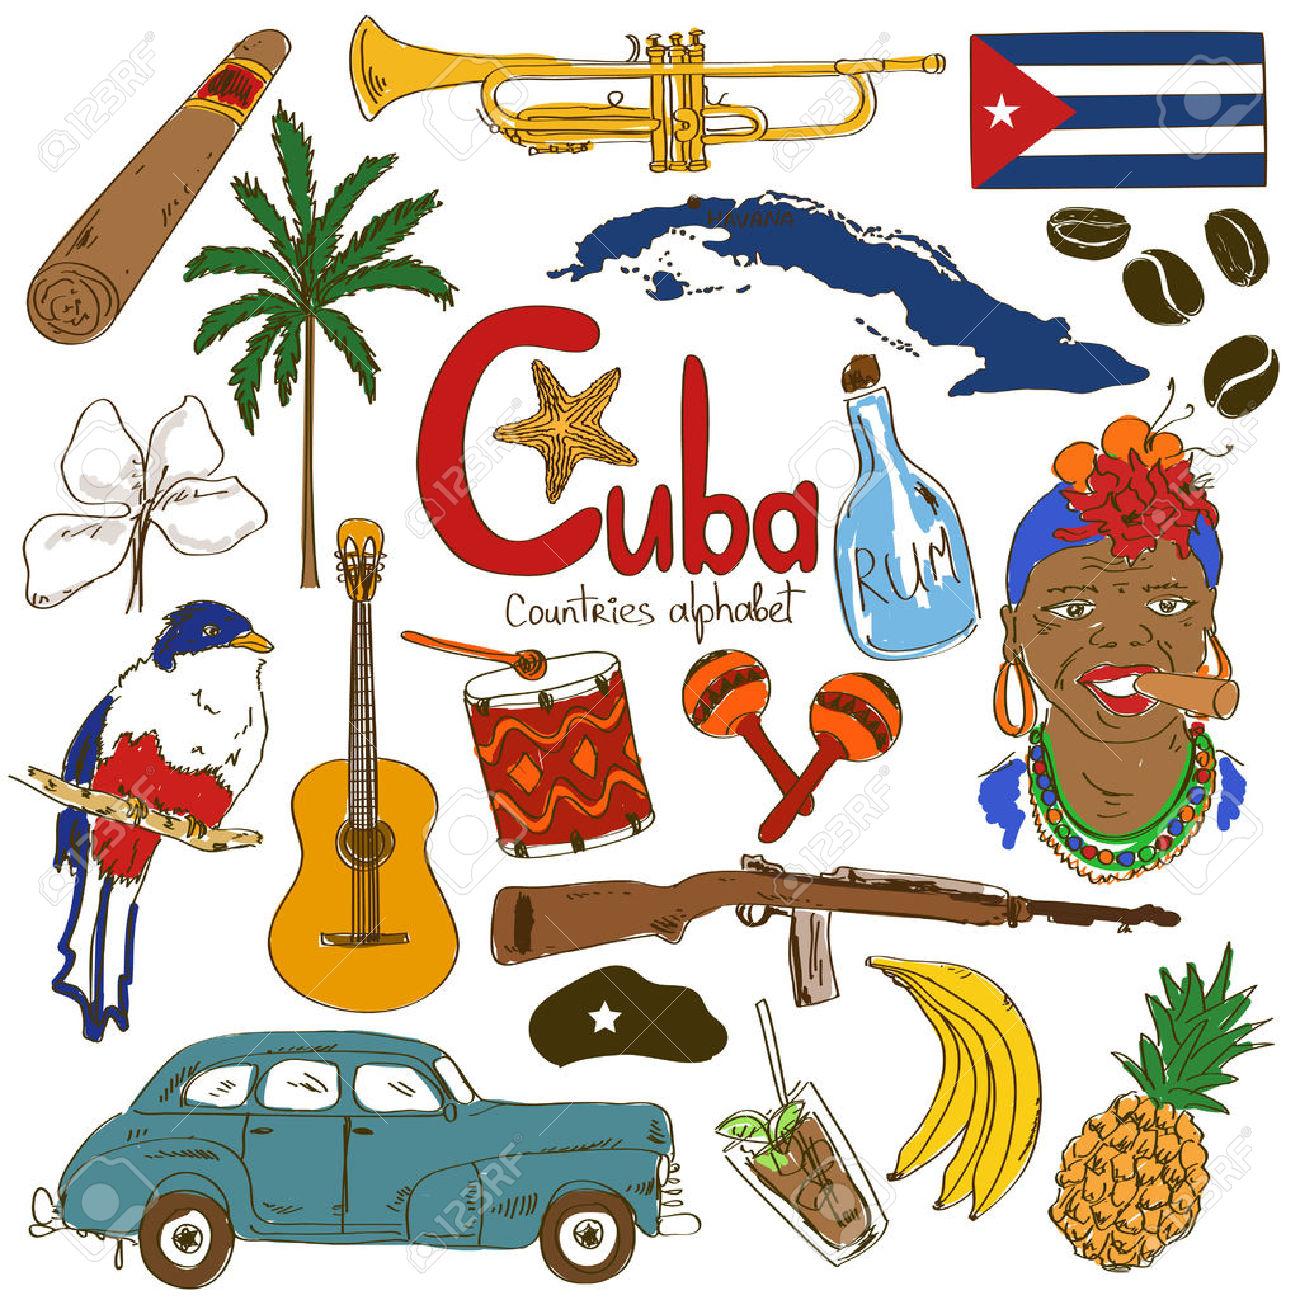 Cuba clipart #17, Download drawings